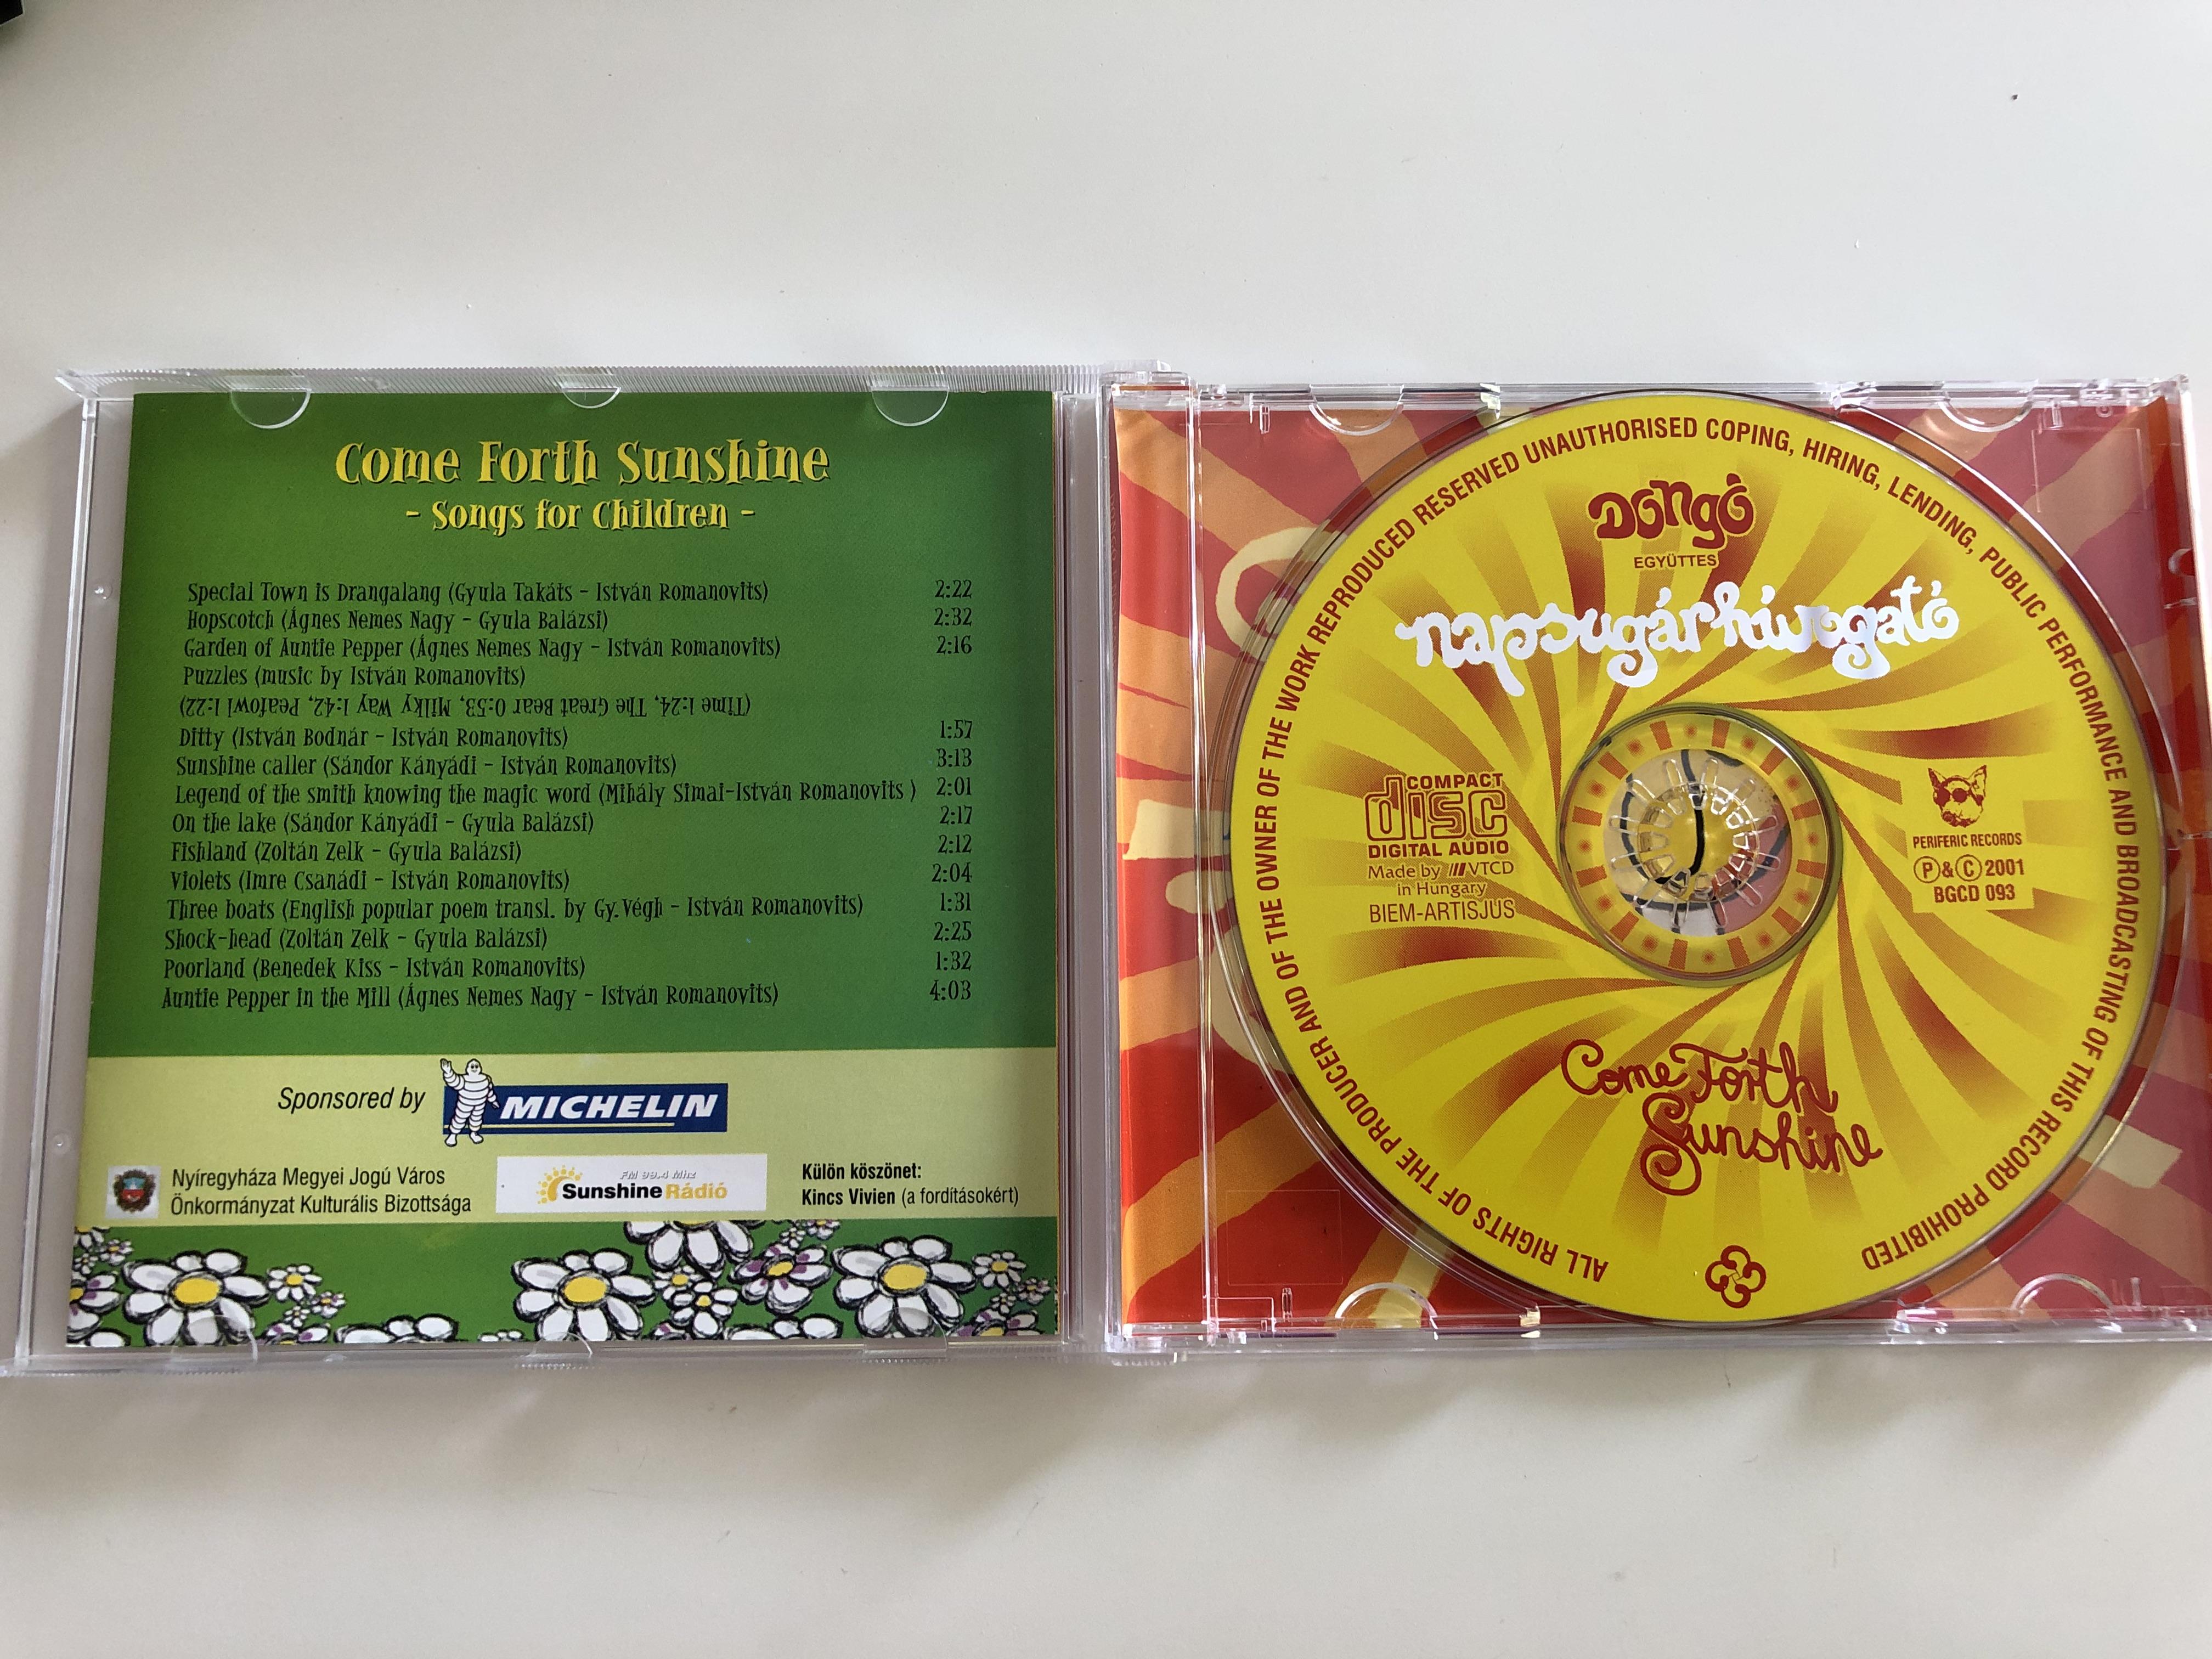 dong-dalok-gyerekeknek-napsug-r-h-vogat-come-forth-sunshine-hungarian-children-s-songs-audio-cd-2001-bgcd-093-5-.jpg